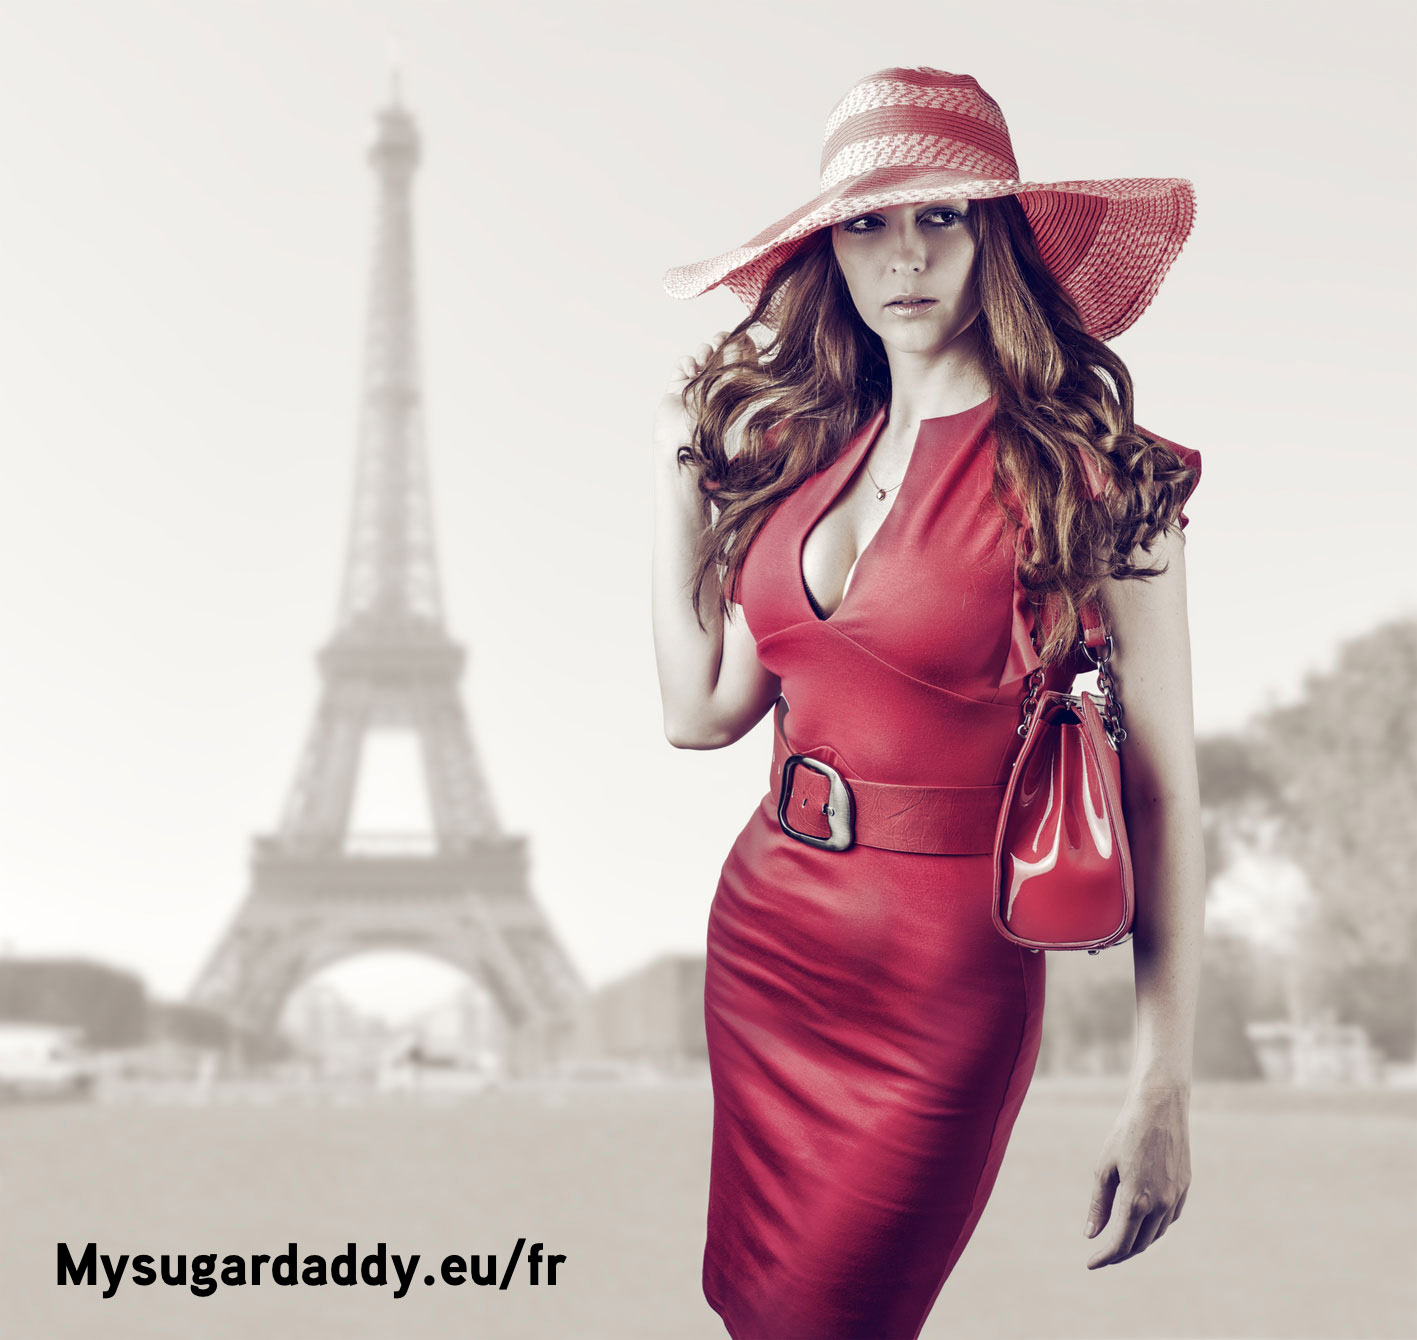 MySugardaddy startet in Frankreich